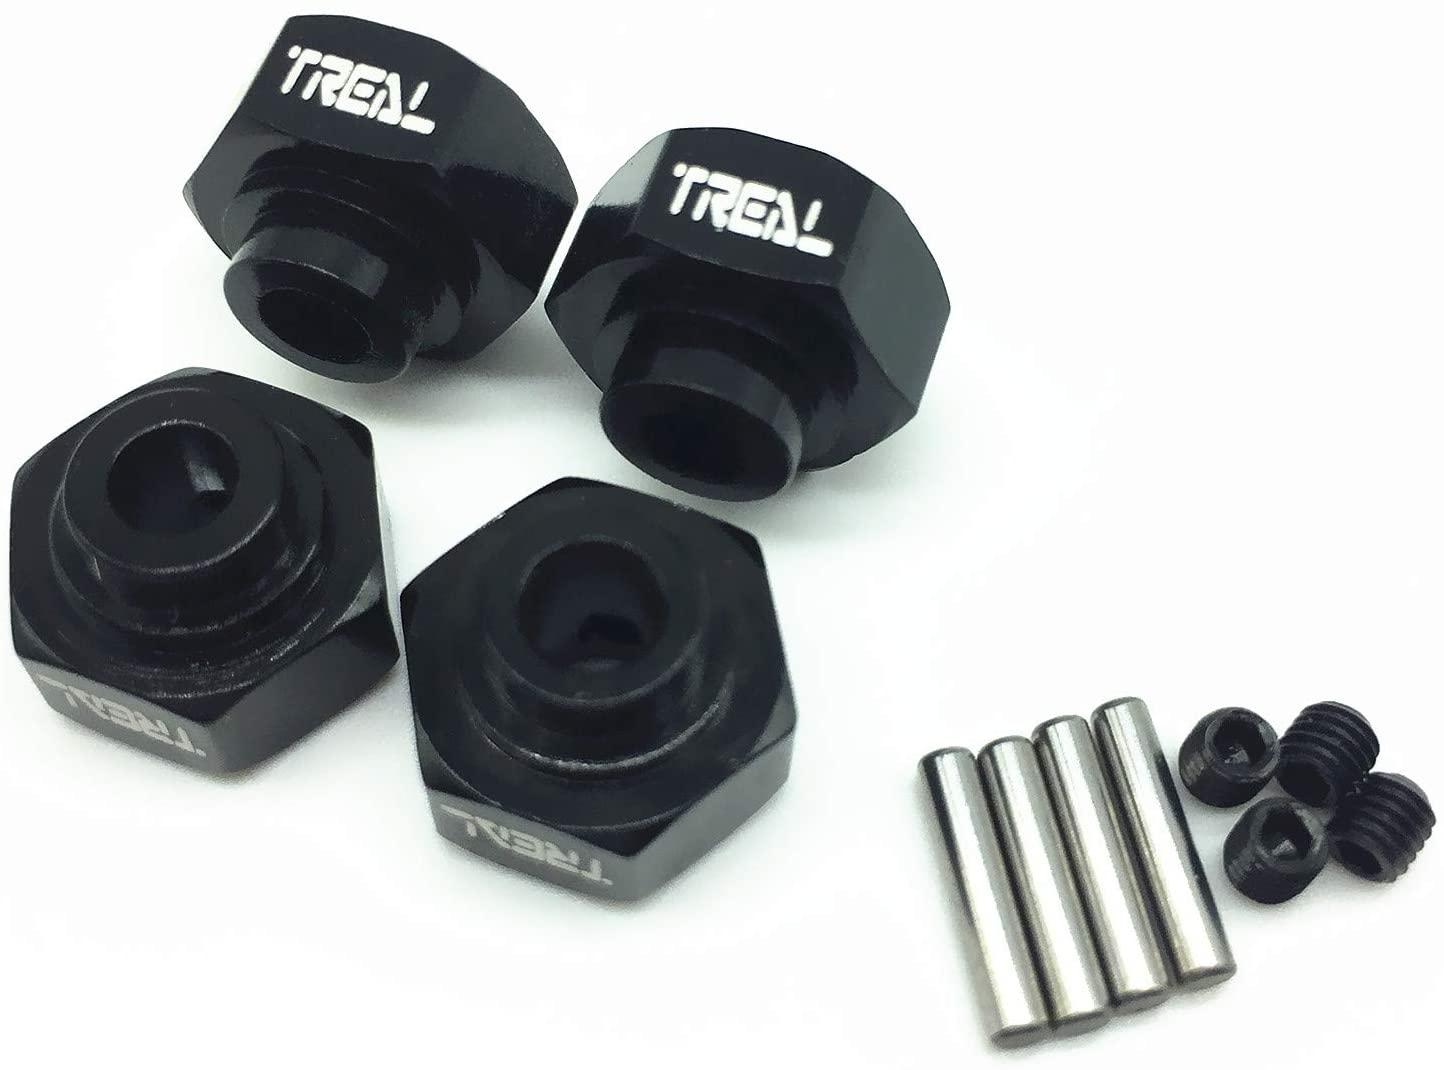 Treal Aluminum Hex Wheel Hub Set Hex Adapter (4) for Axial Wraith - Black